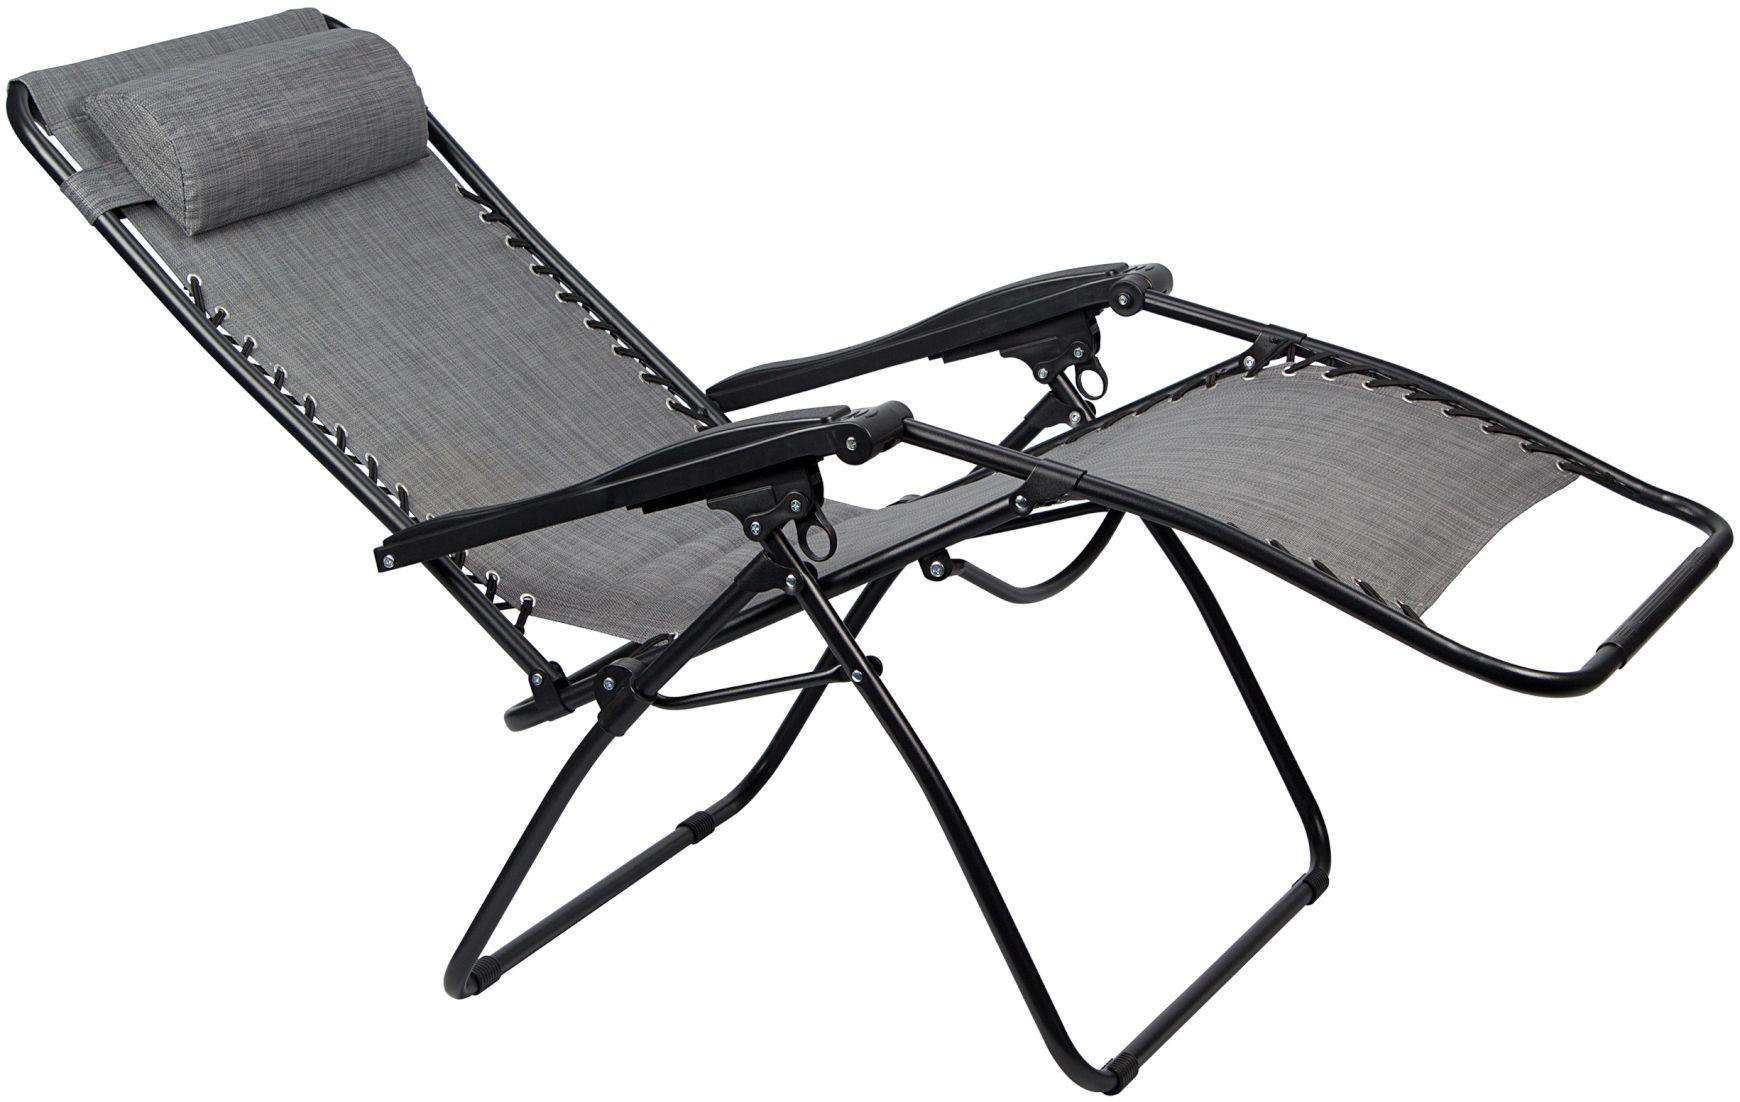 Scaun camping AbbeyCamp  • Chaise Longue XXL •